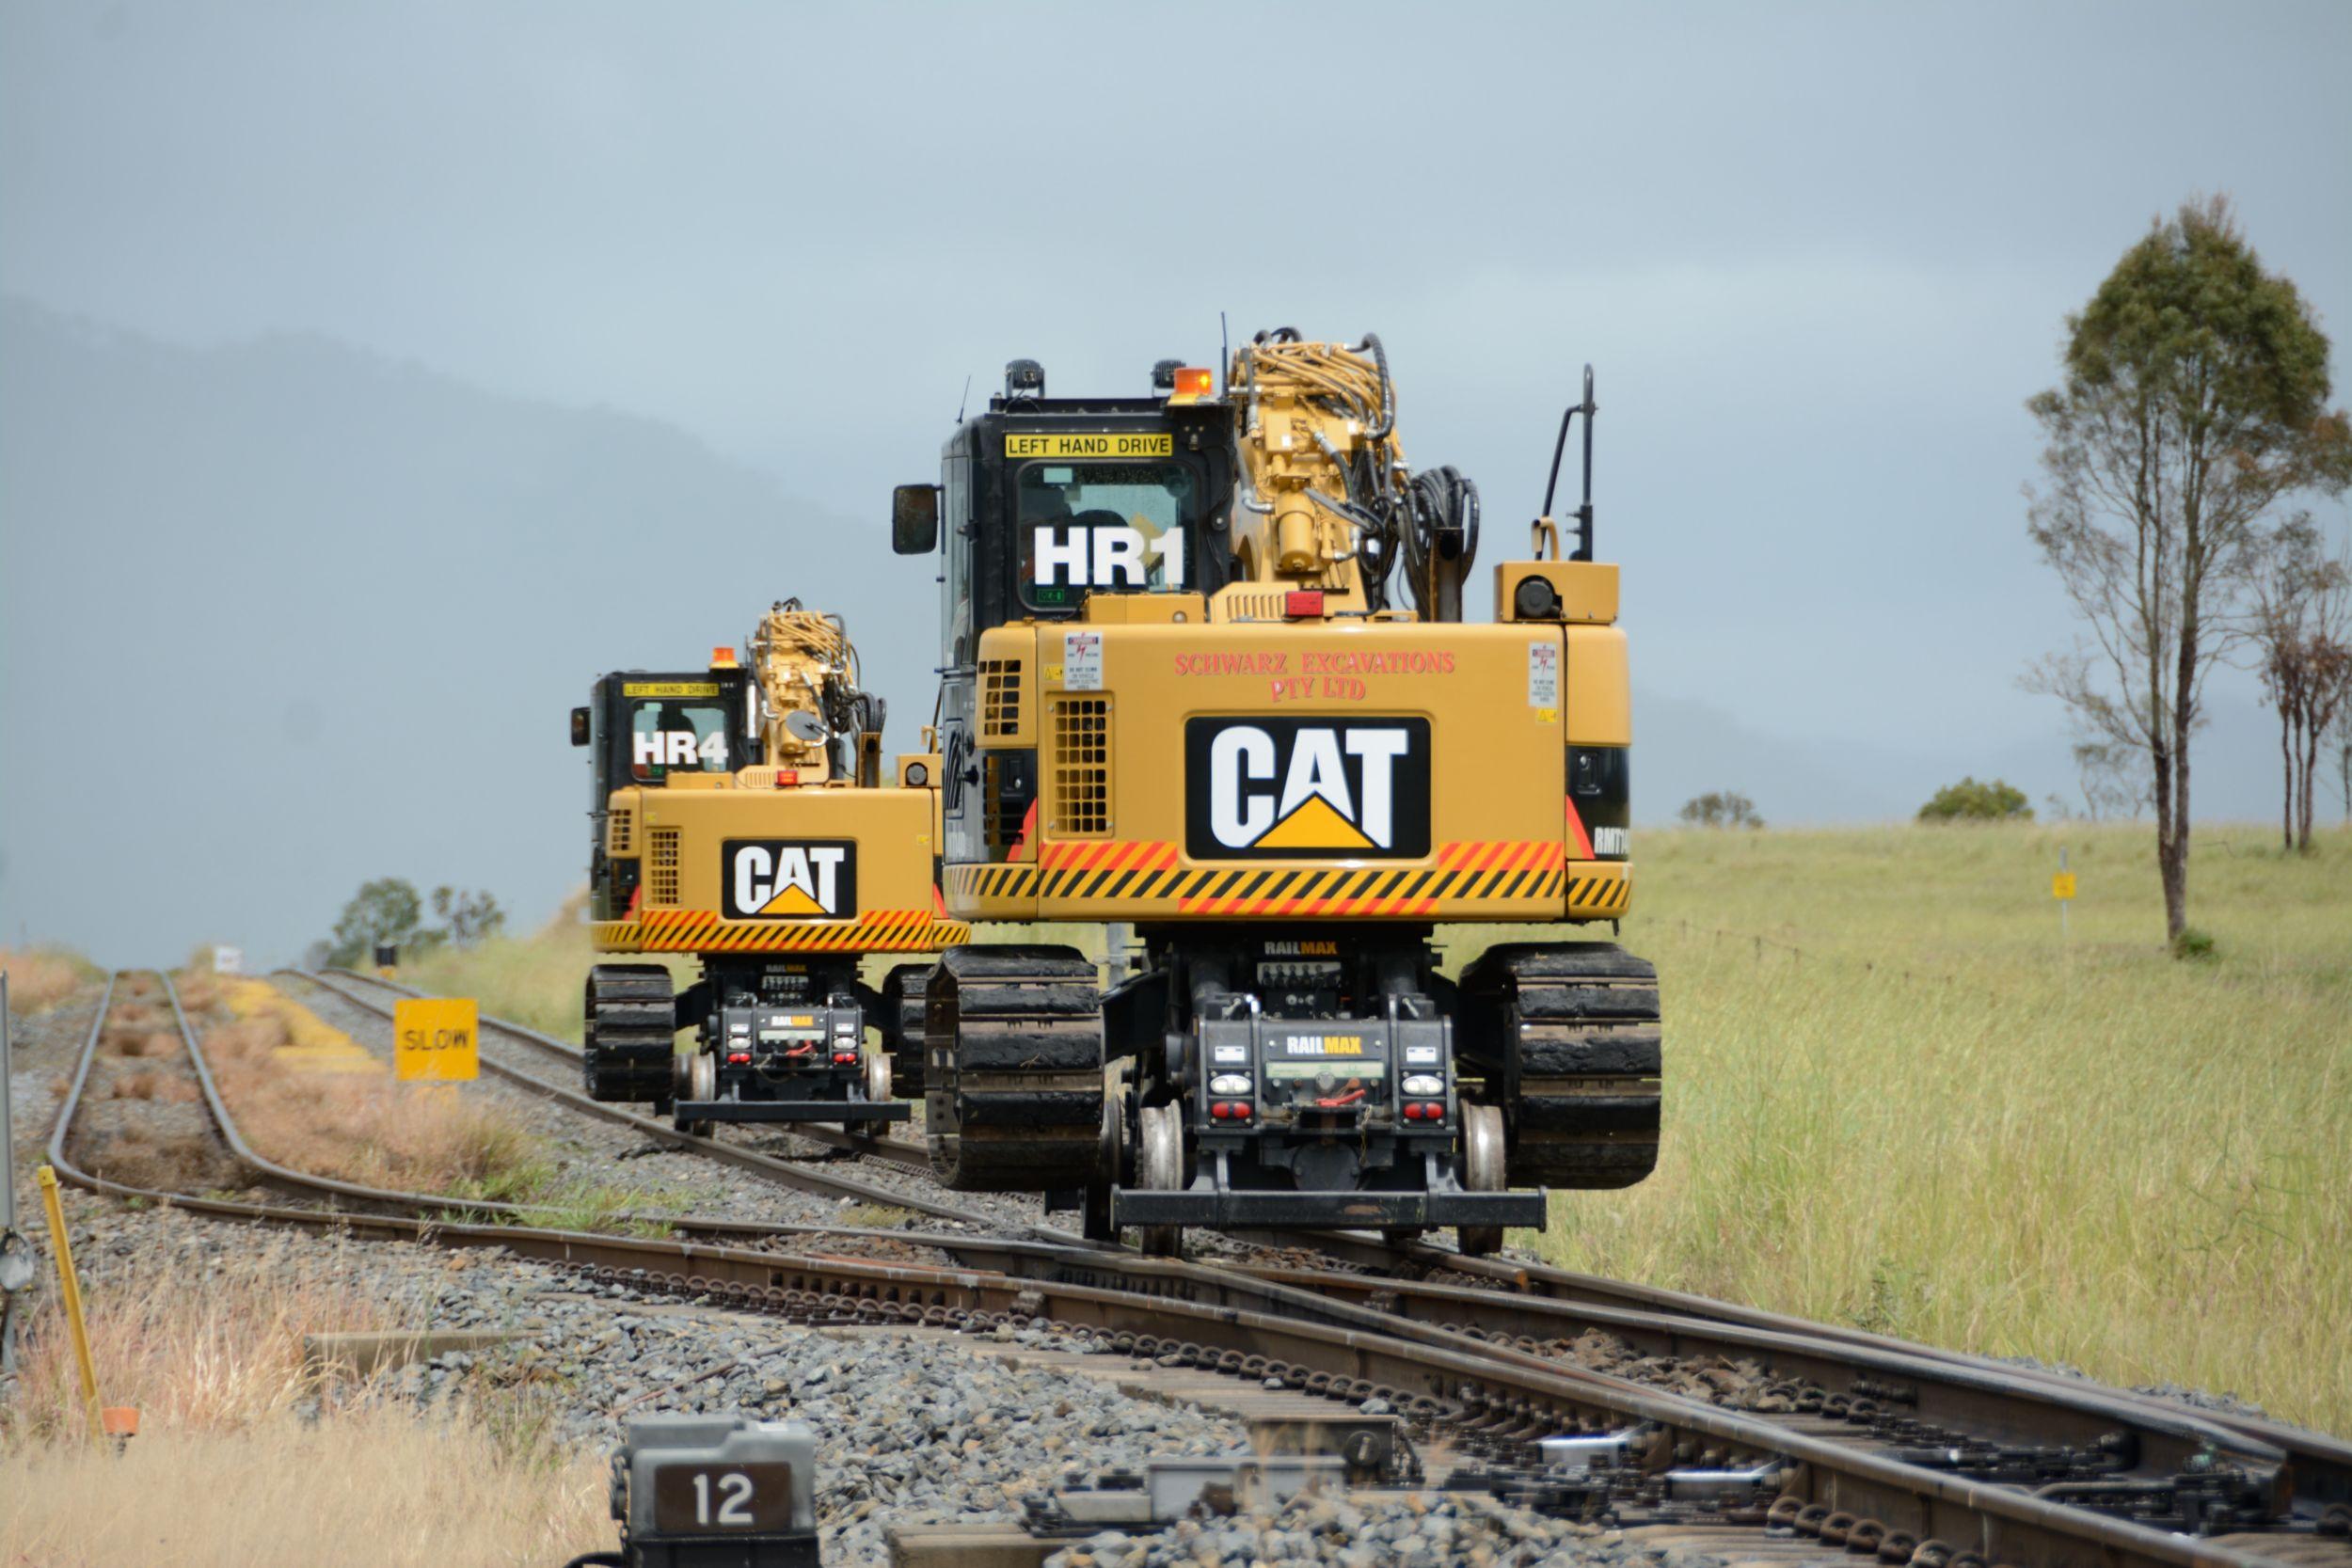 Cat Rail Equipment Cuts Maintenance Time Caterpillar